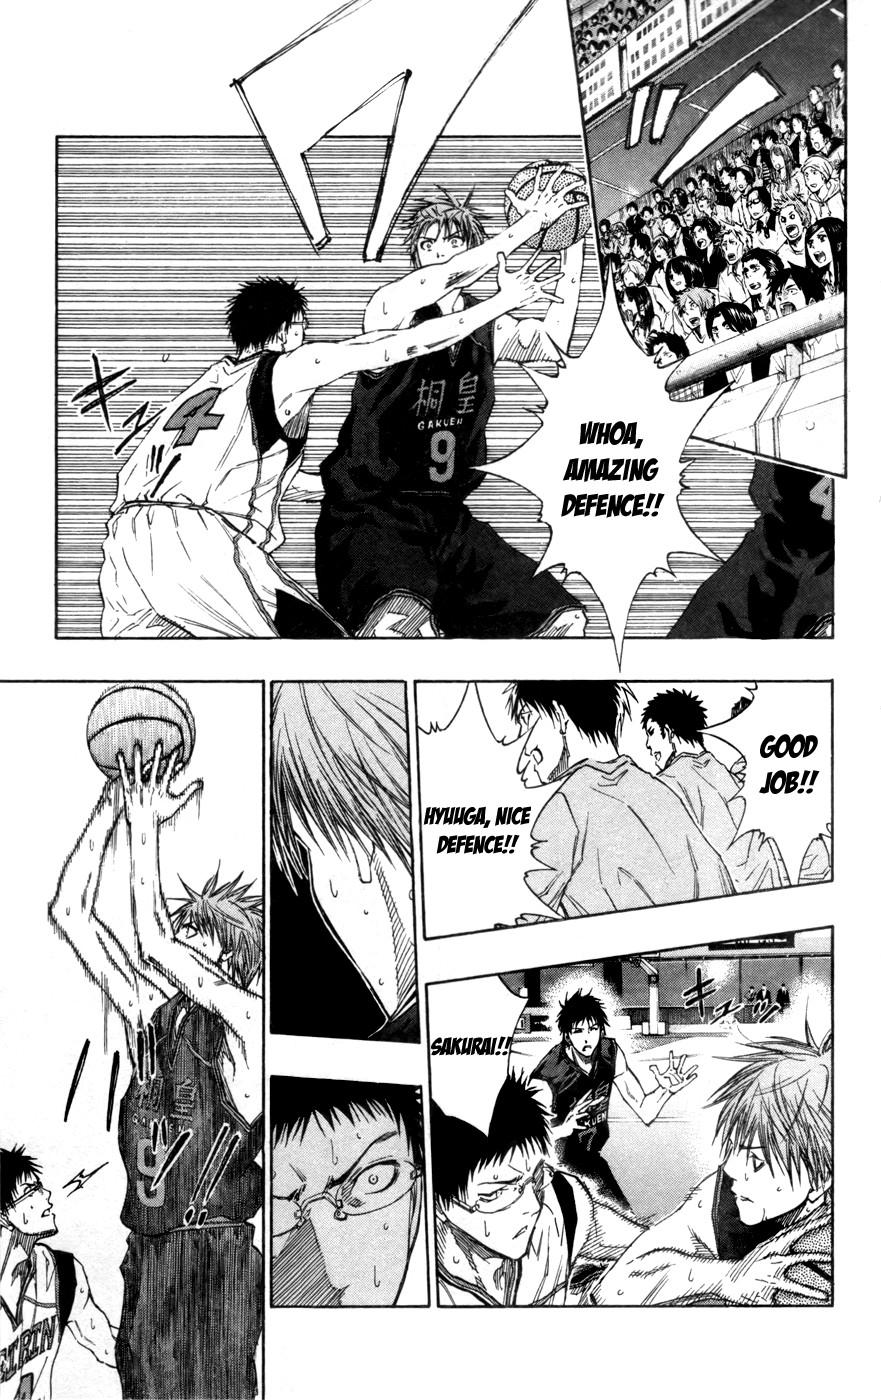 Kuroko no Basket Manga Chapter 118 - Image 4_011